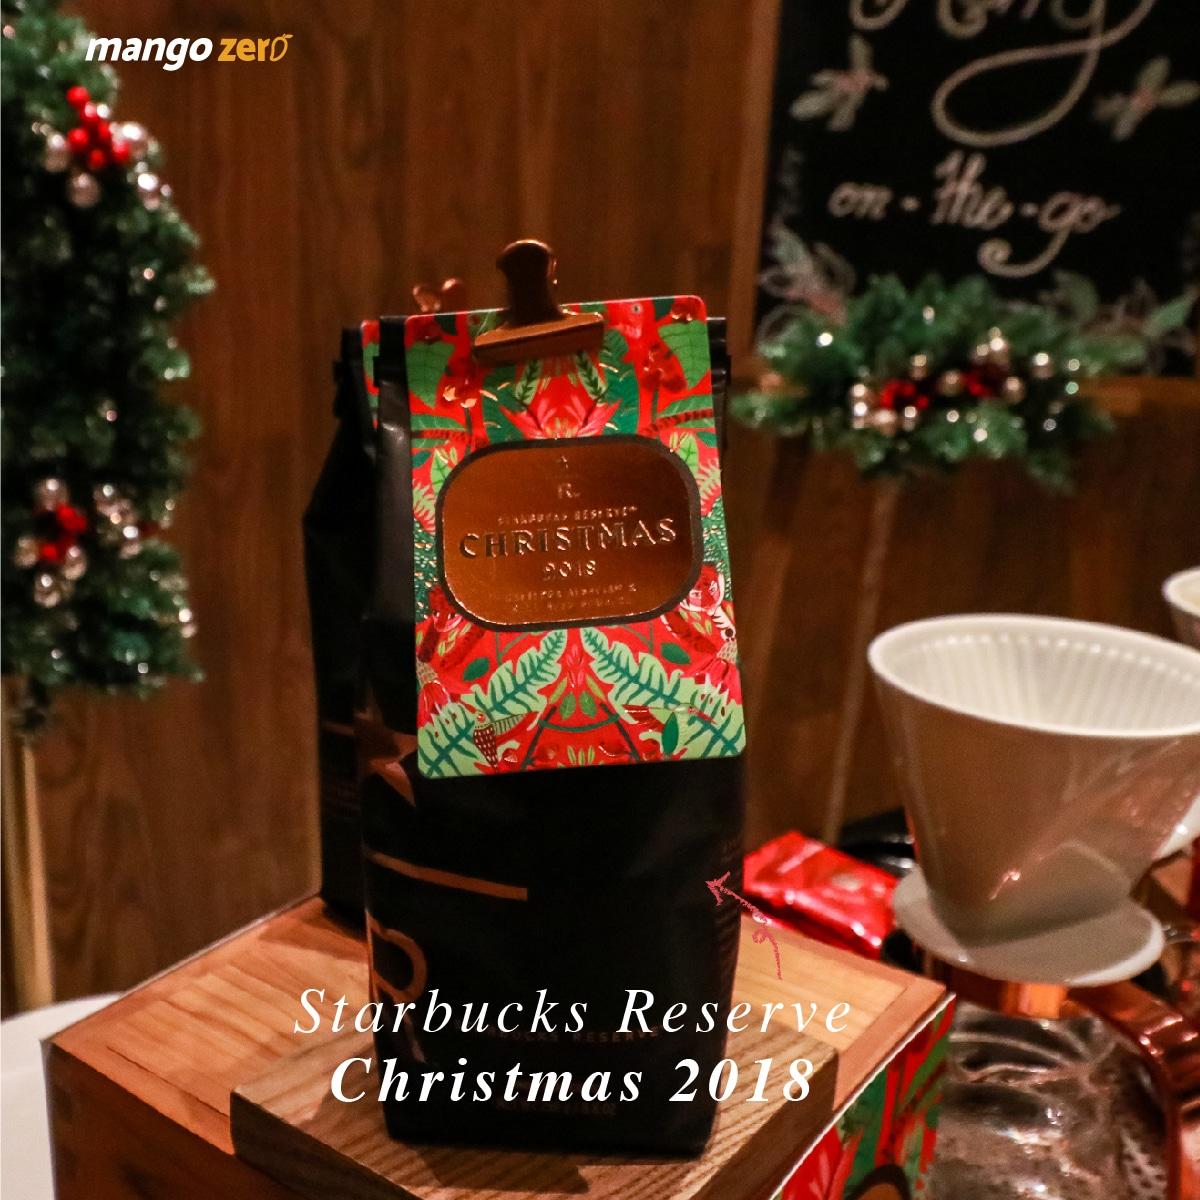 Christmas is here : ต้อนรับเทศกาลความสุขกับ